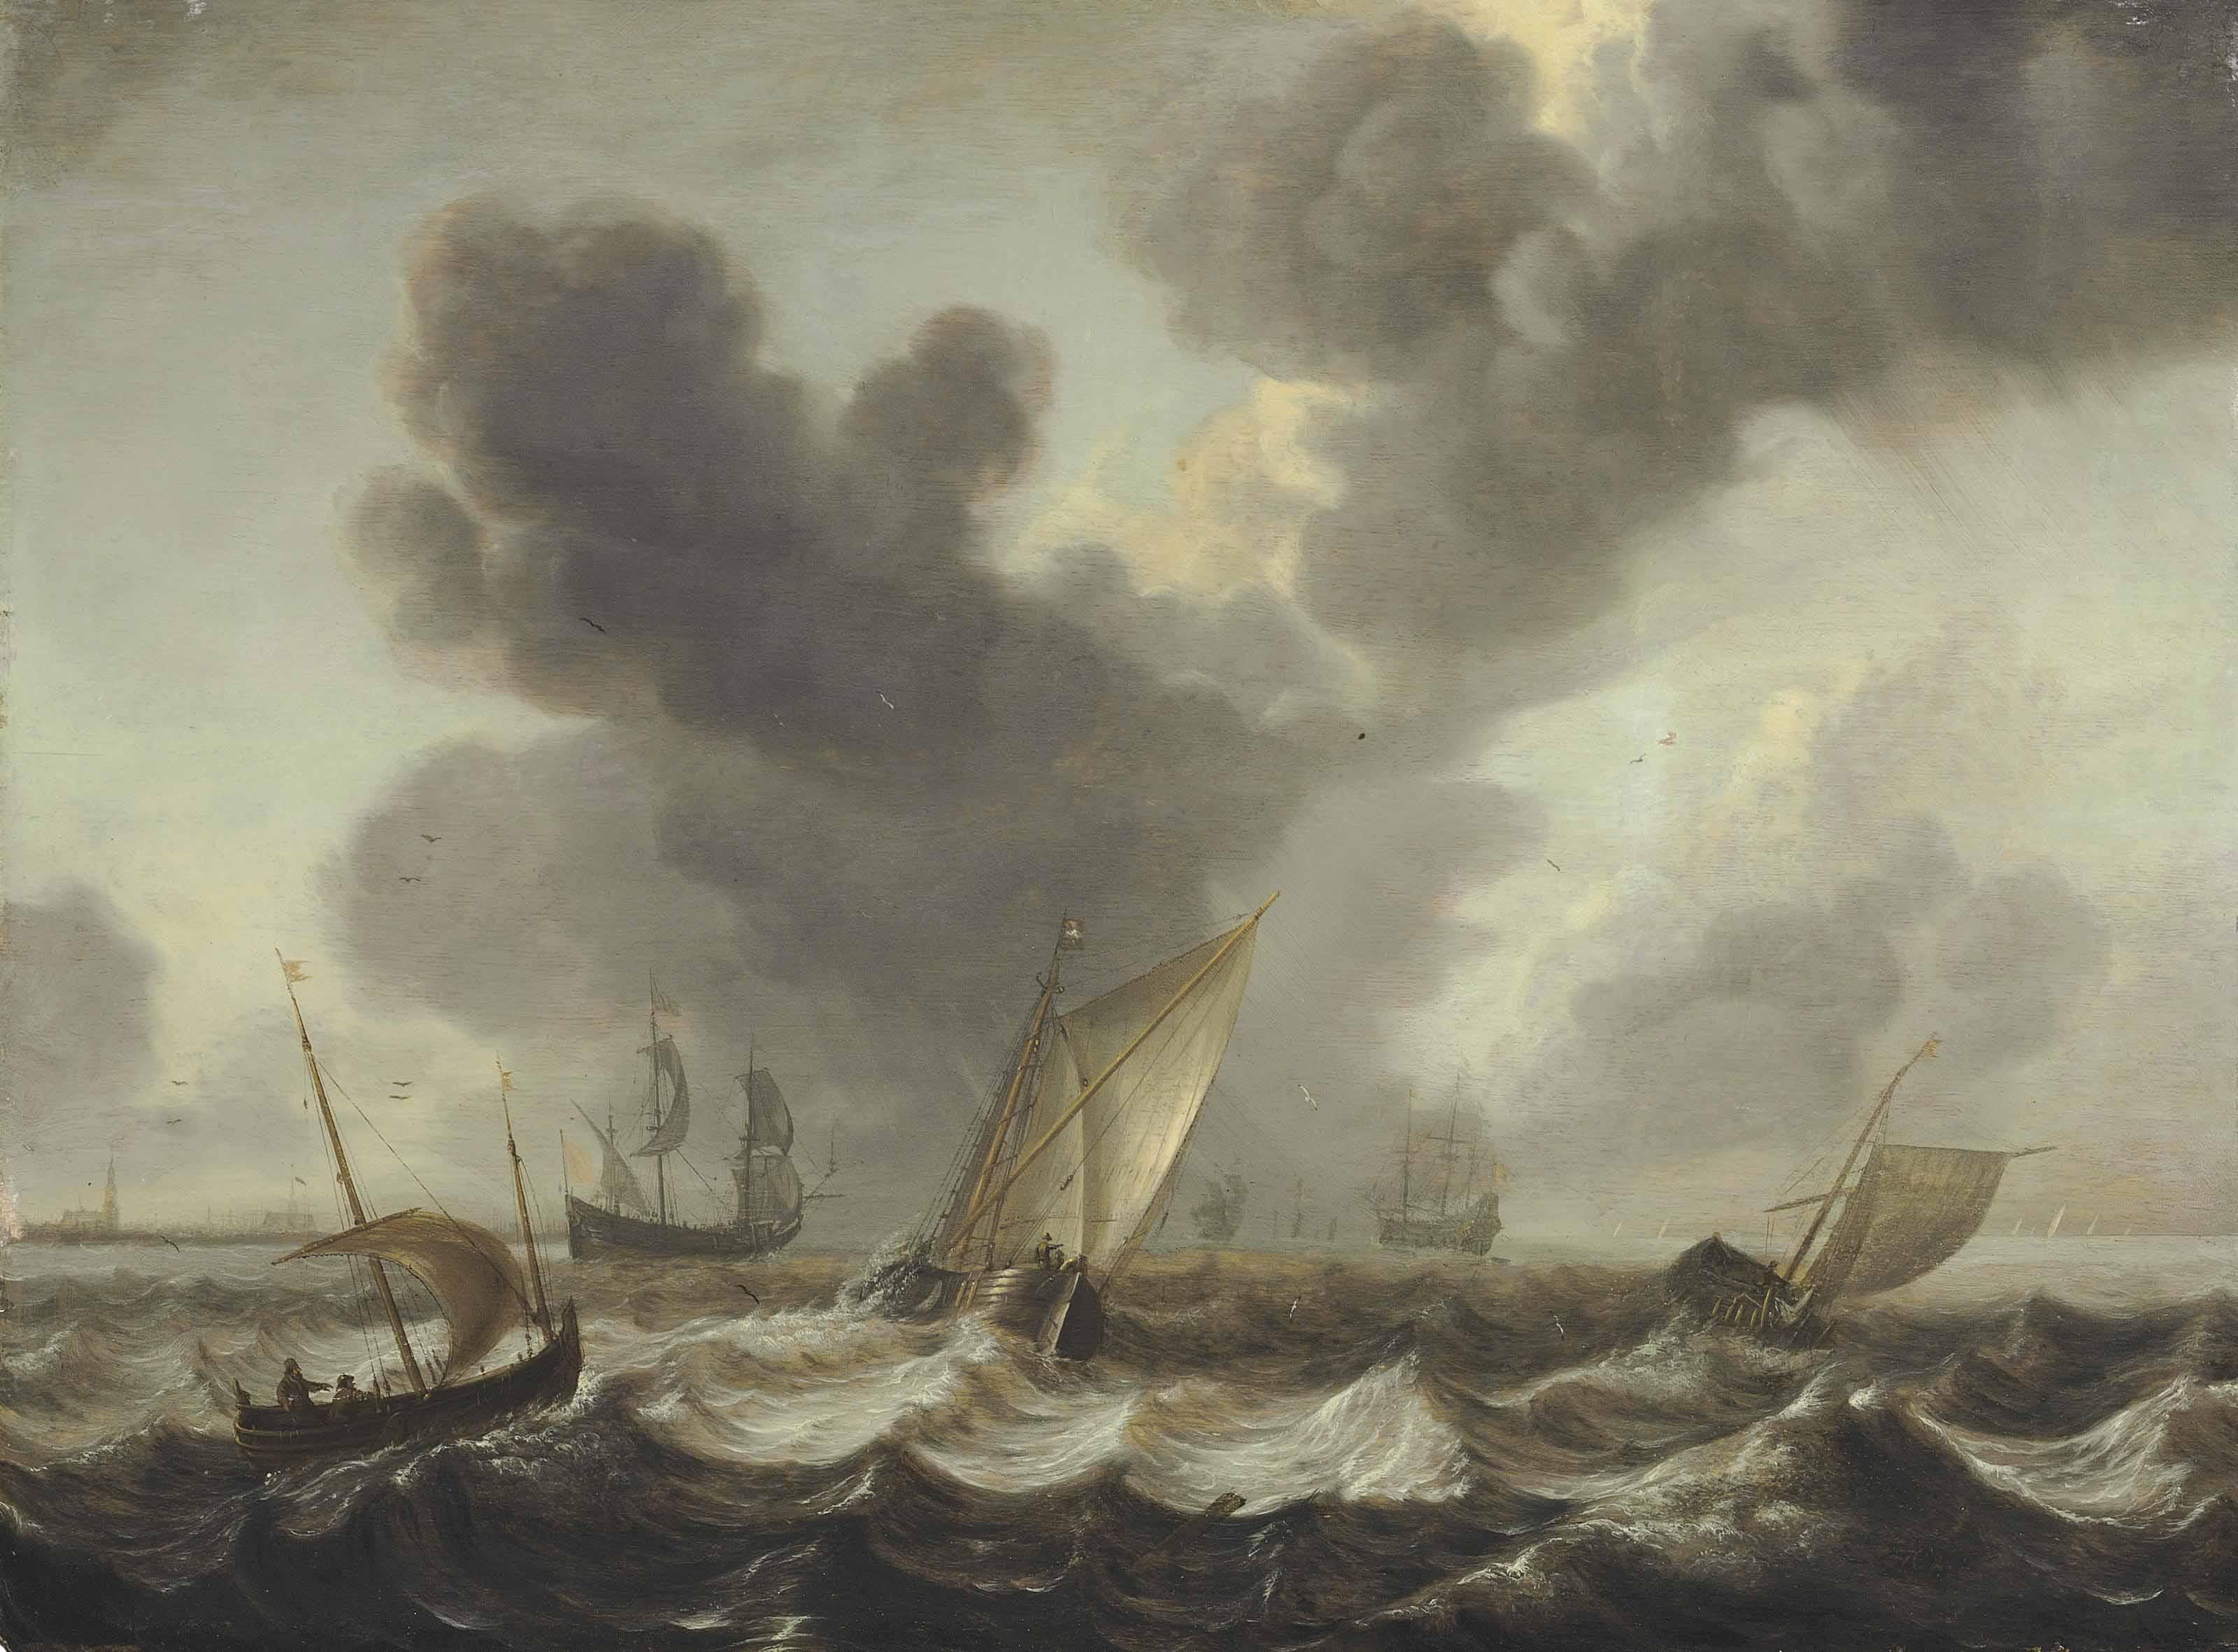 Shipping on rough seas